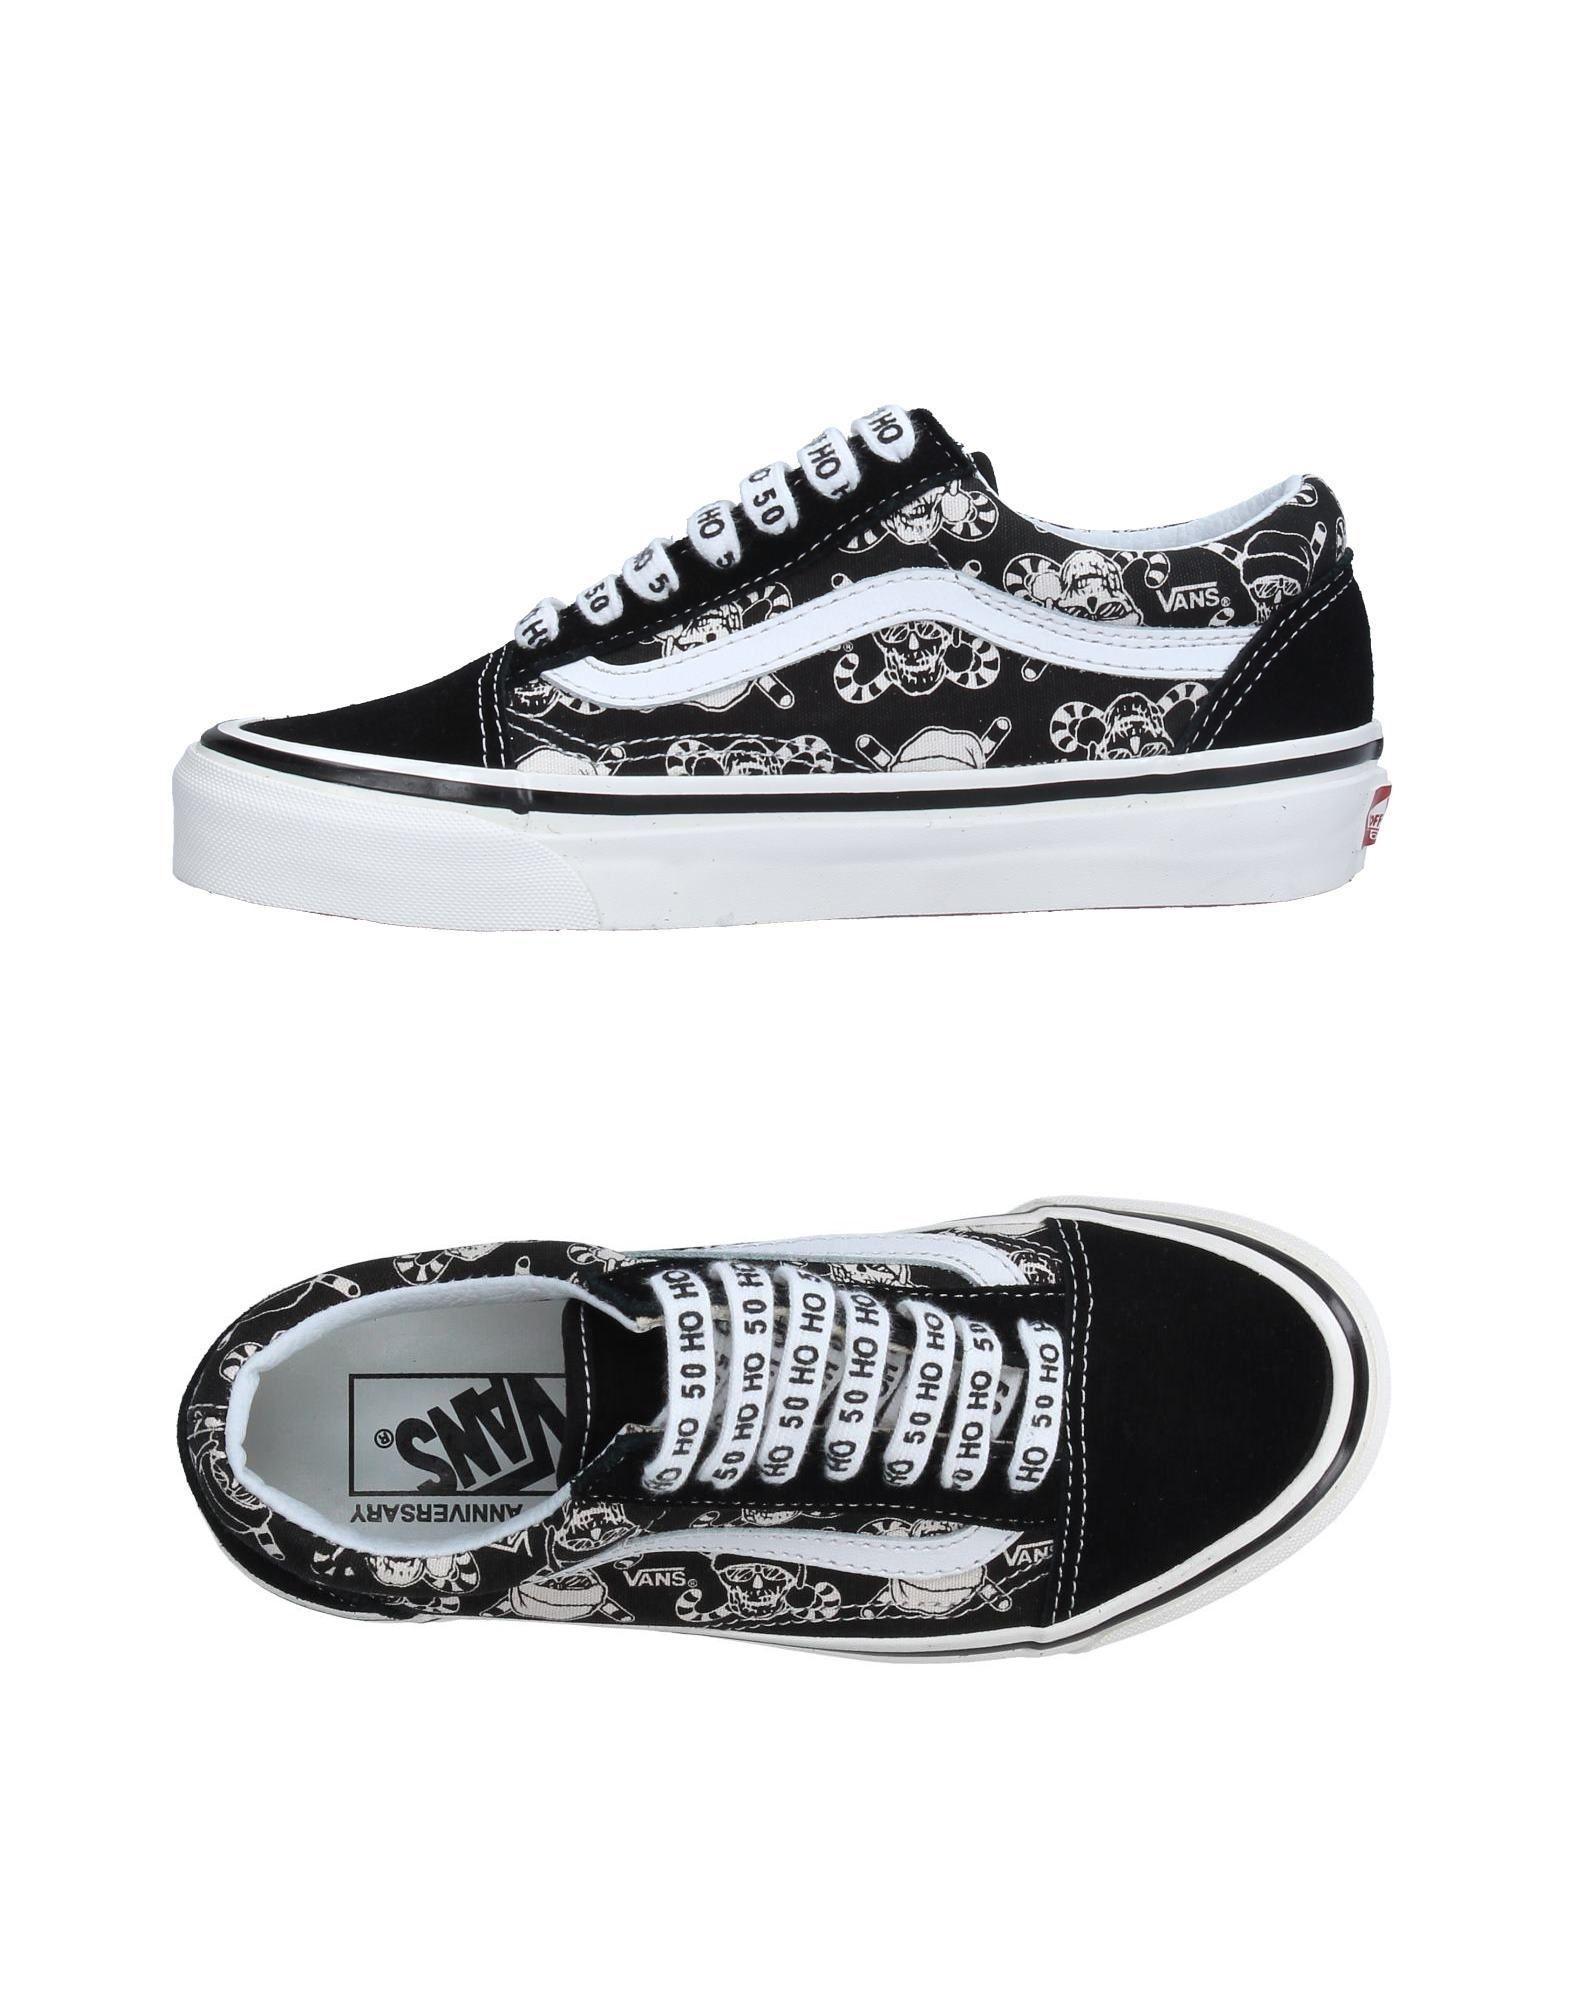 Vans Shoes Origin